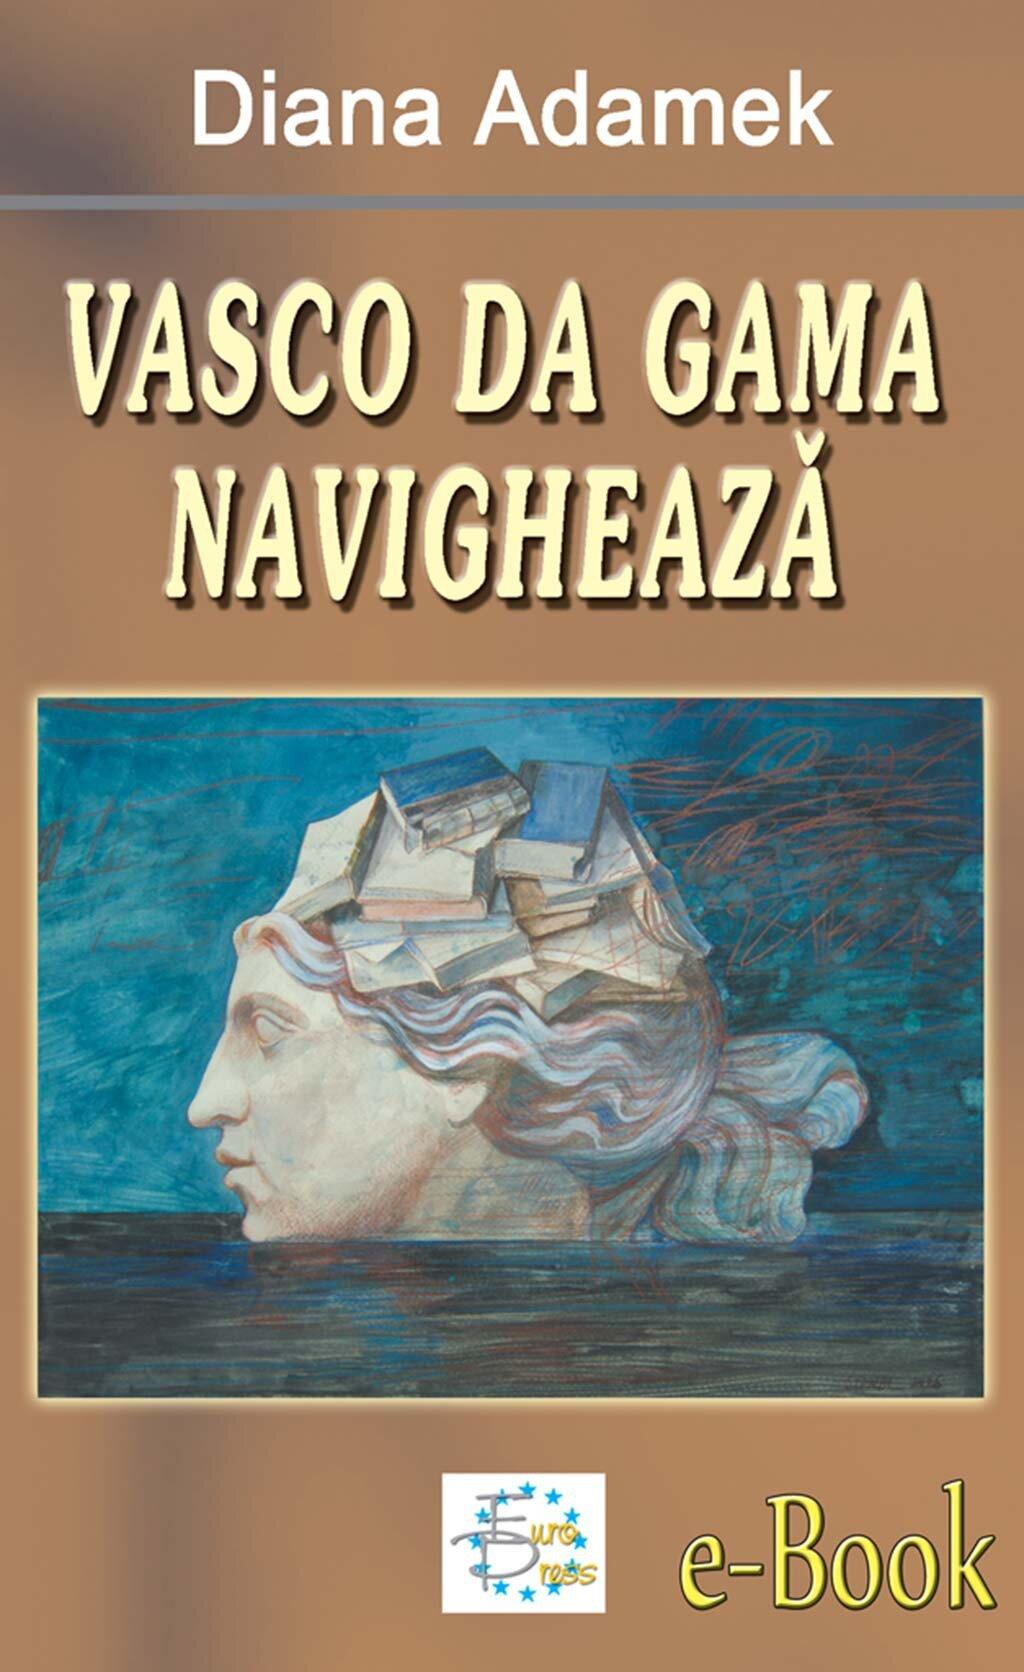 Vasco da Gama navigheaza (eBook)